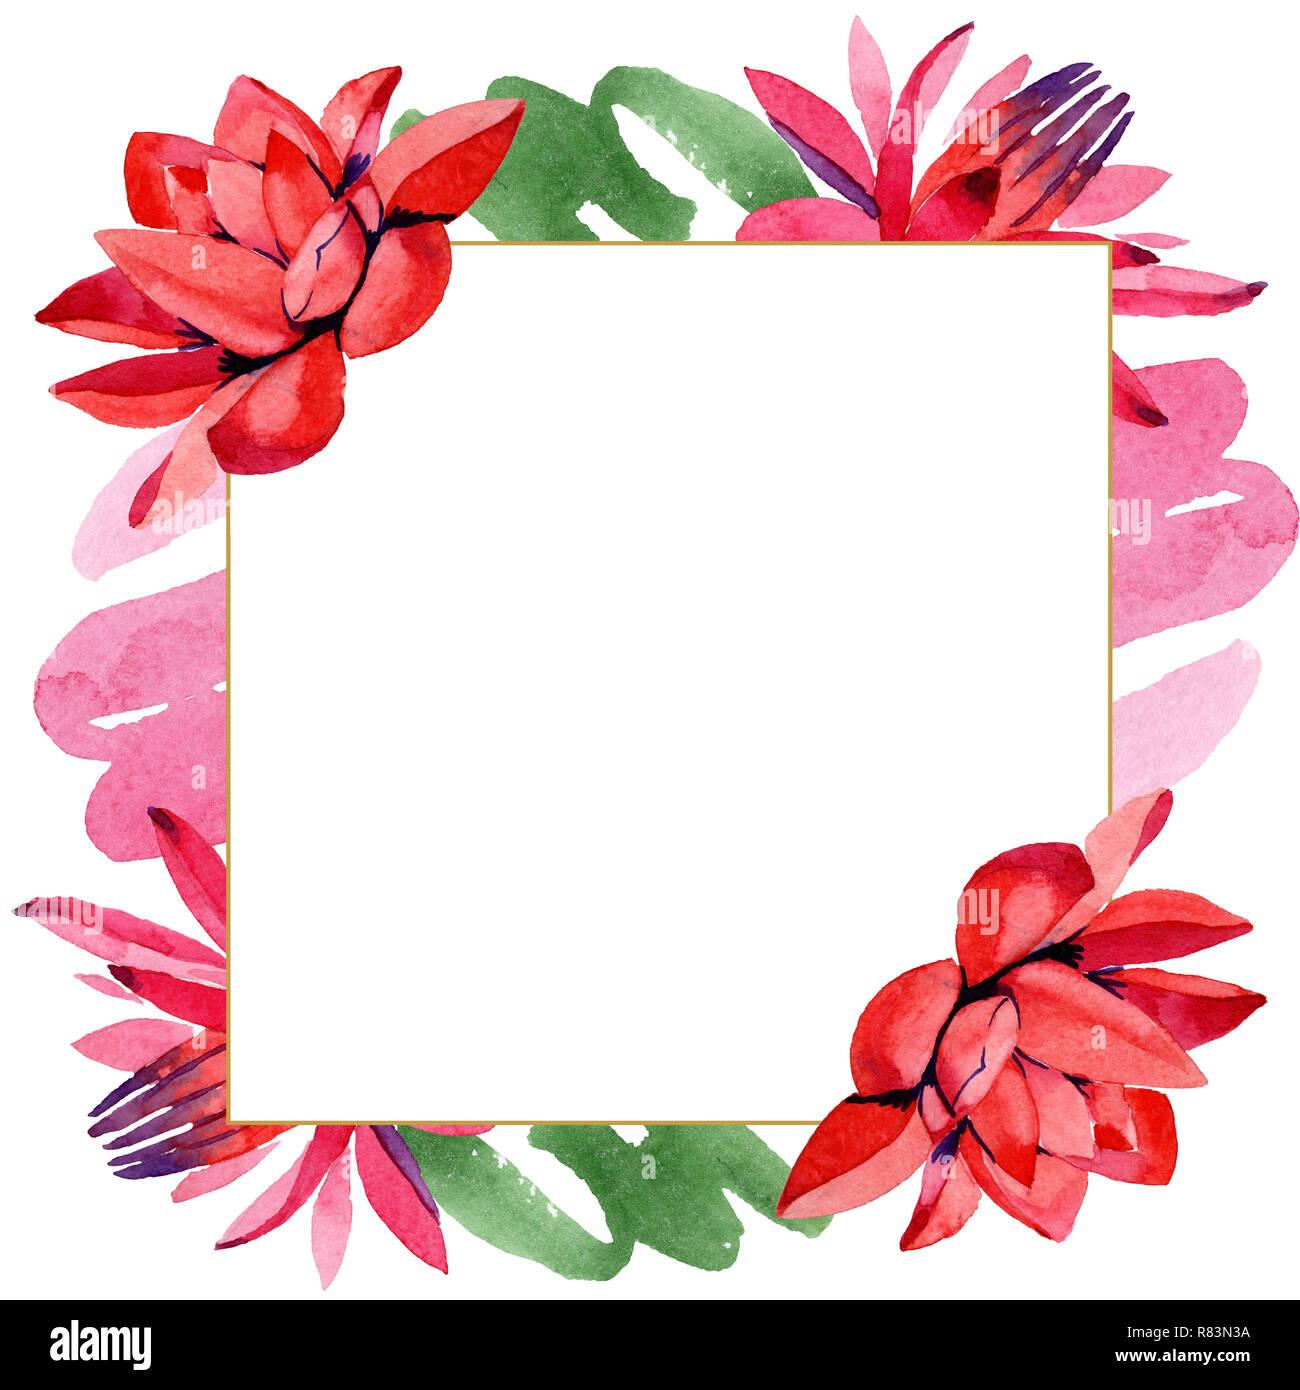 85ad5167938e Red lotus. Floral botanical flower. Watercolor background illustration set. Frame  border ornament square